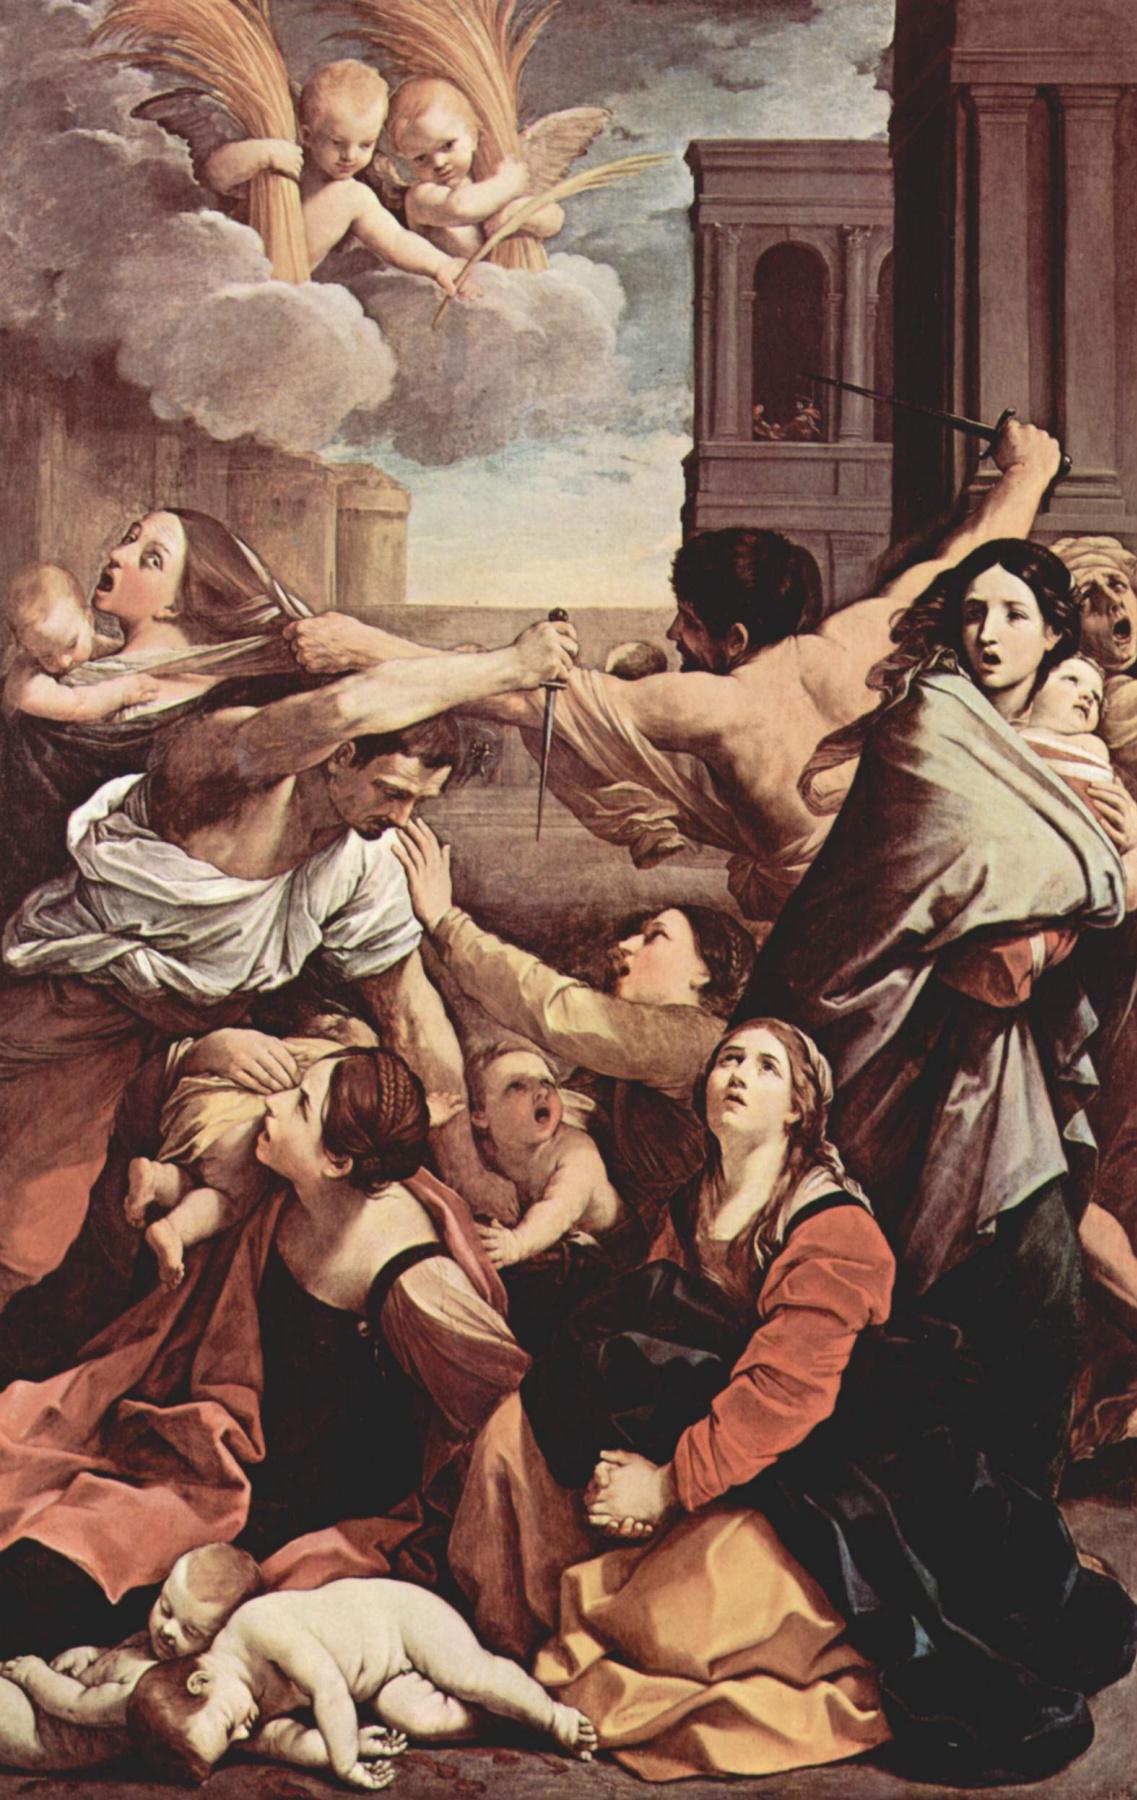 Guido Reni. The massacre of the innocents